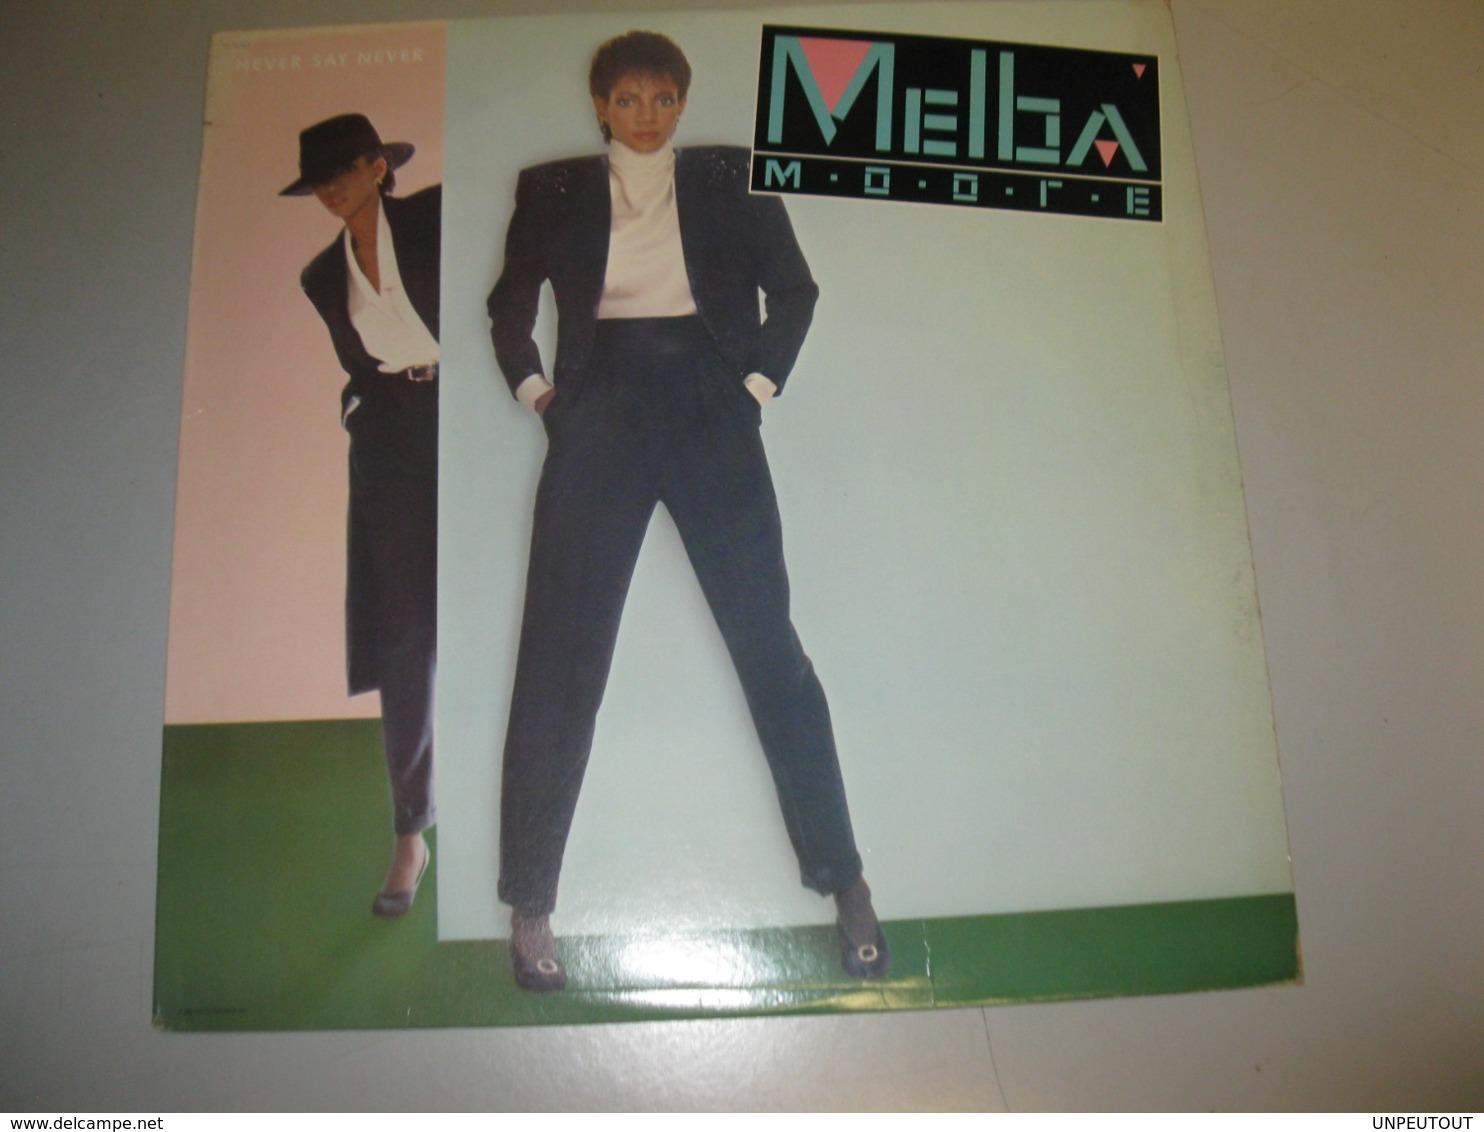 "VINYLE MELBA MOORE ""NEVER SAY NEVER"" 33 T CAPITOL (1983) - Vinyl Records"